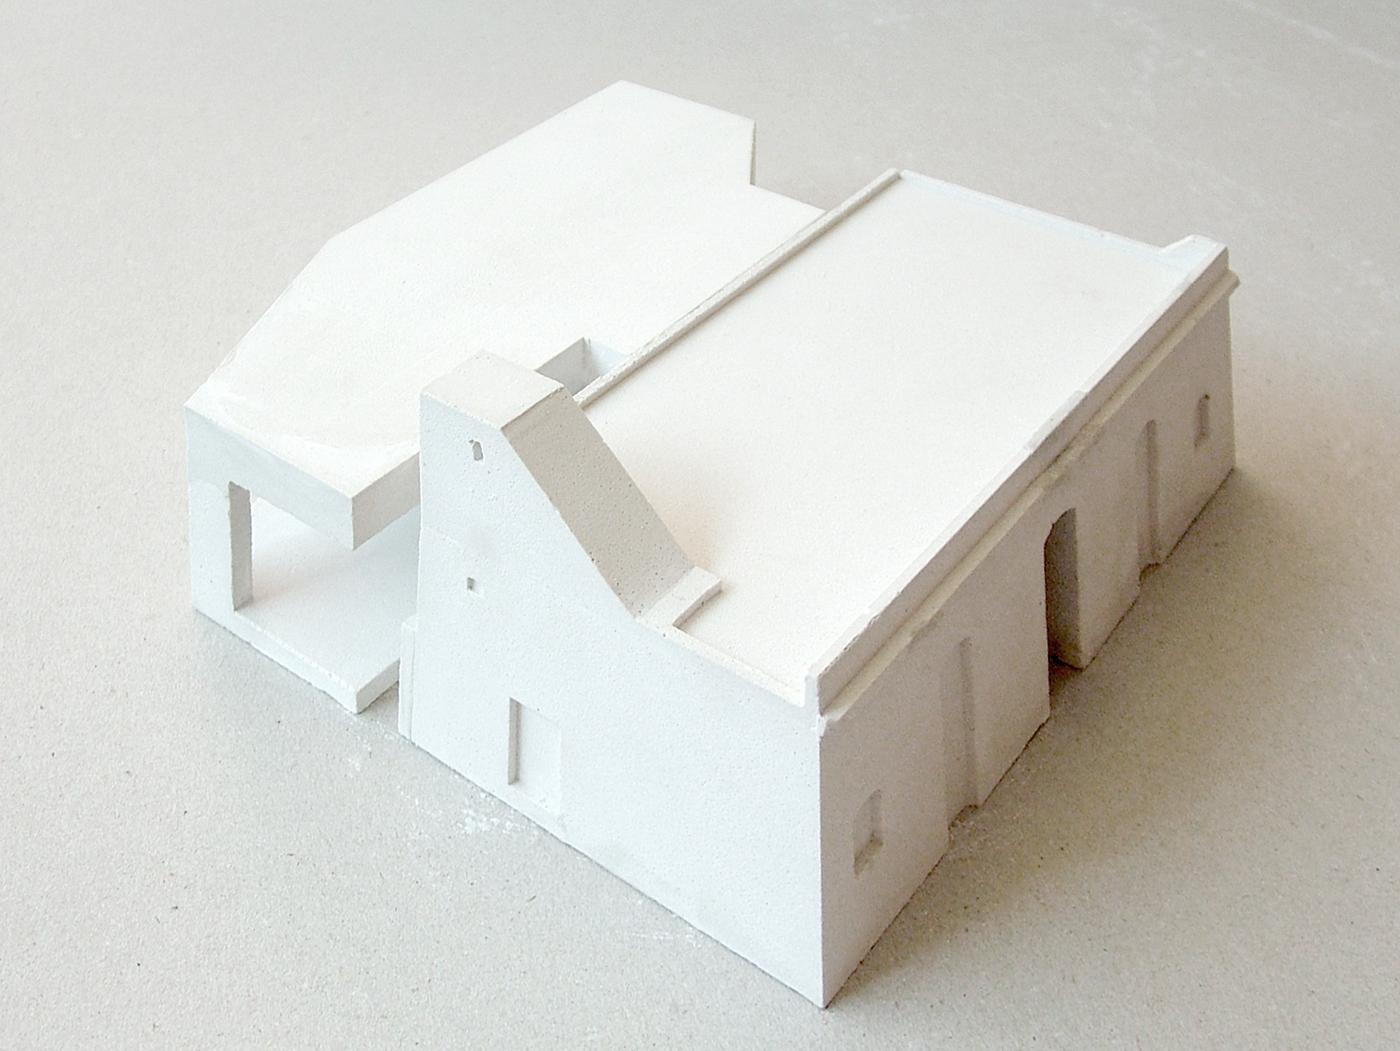 plaster model architectural model maquette housing belgium vlaanders 1:50 1:100 hand made